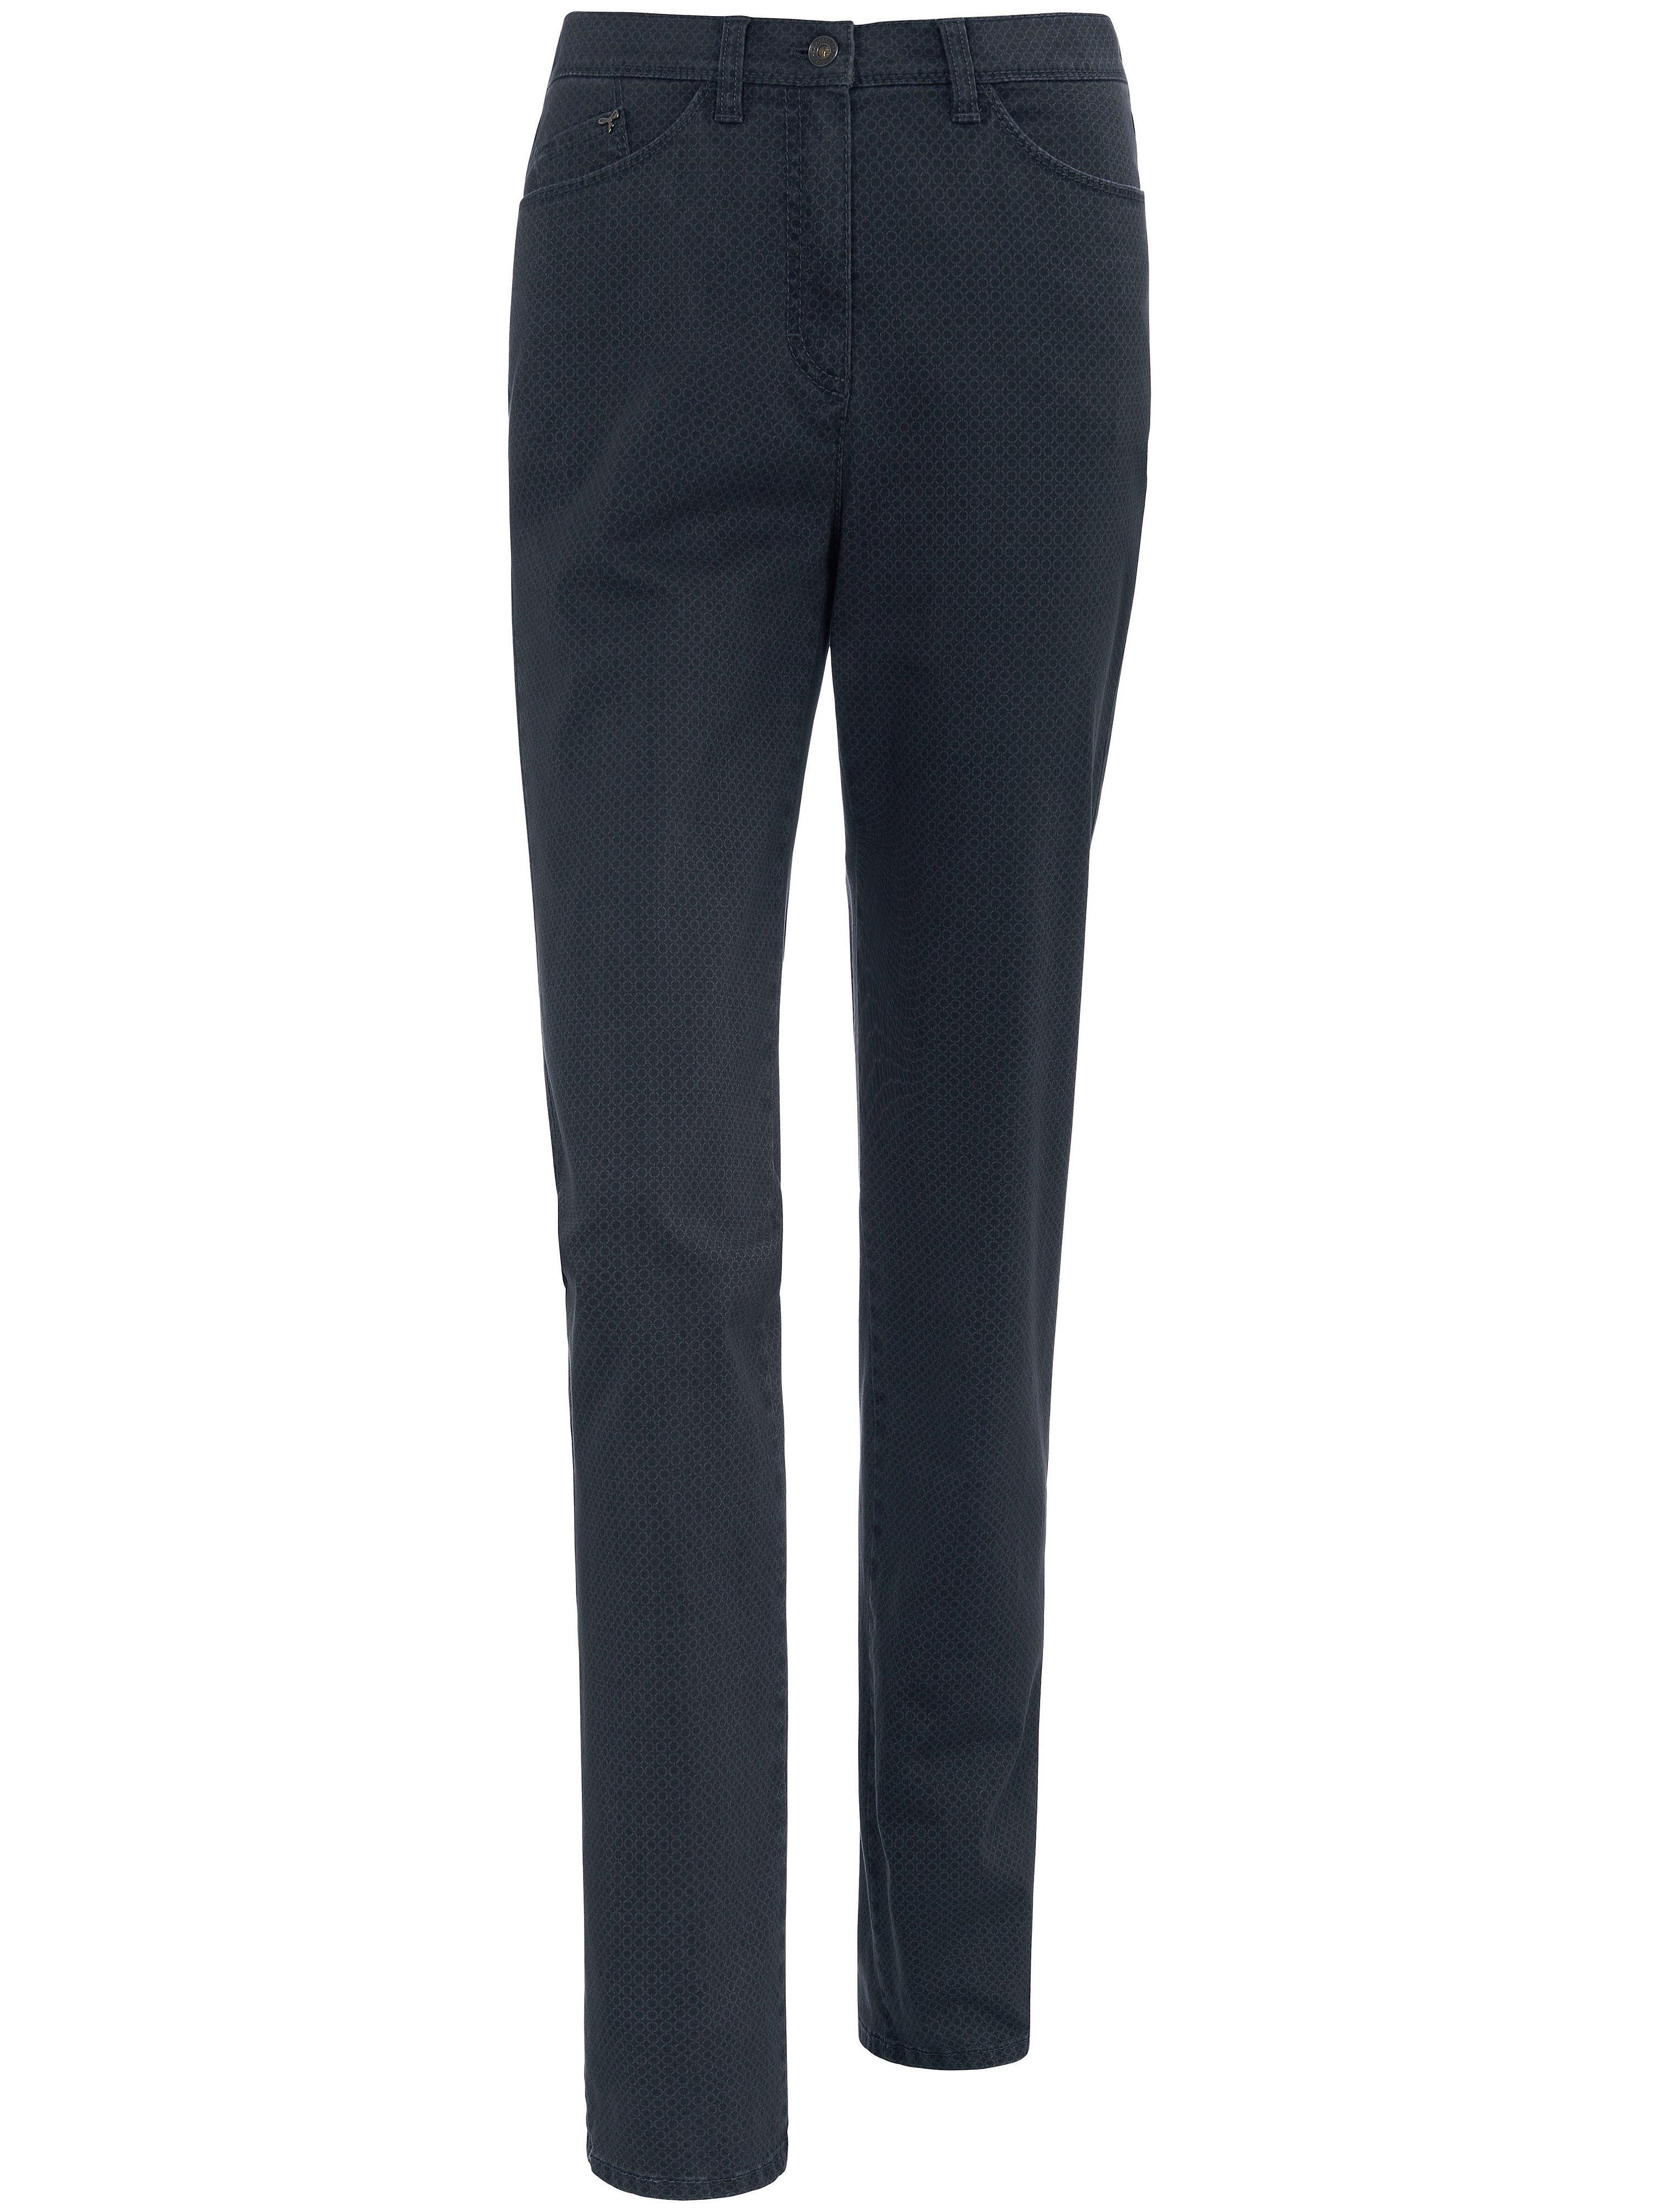 Image of   'ProForm S Super Slim'-jeans Fra Raphaela by Brax blå